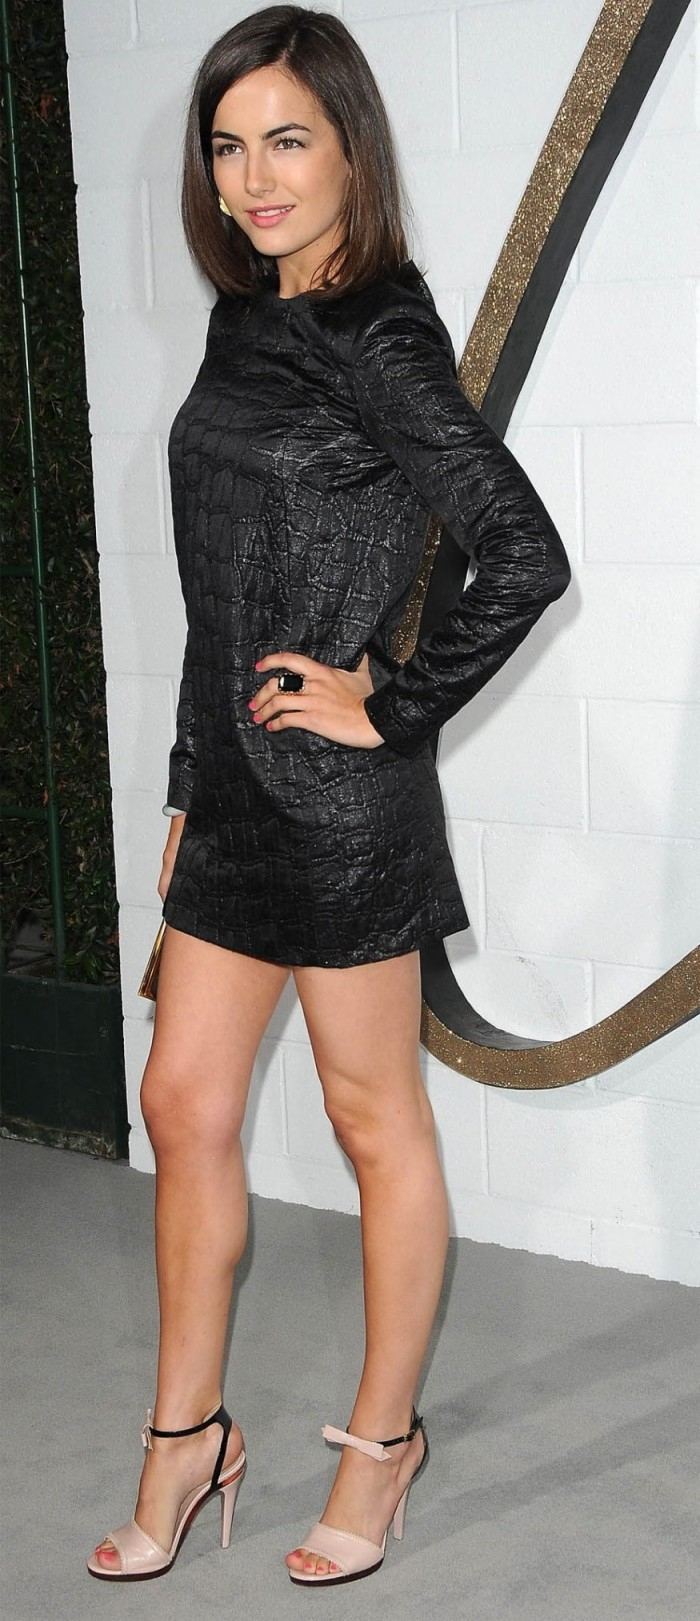 La jolie Camilla Belle est vraiment hot